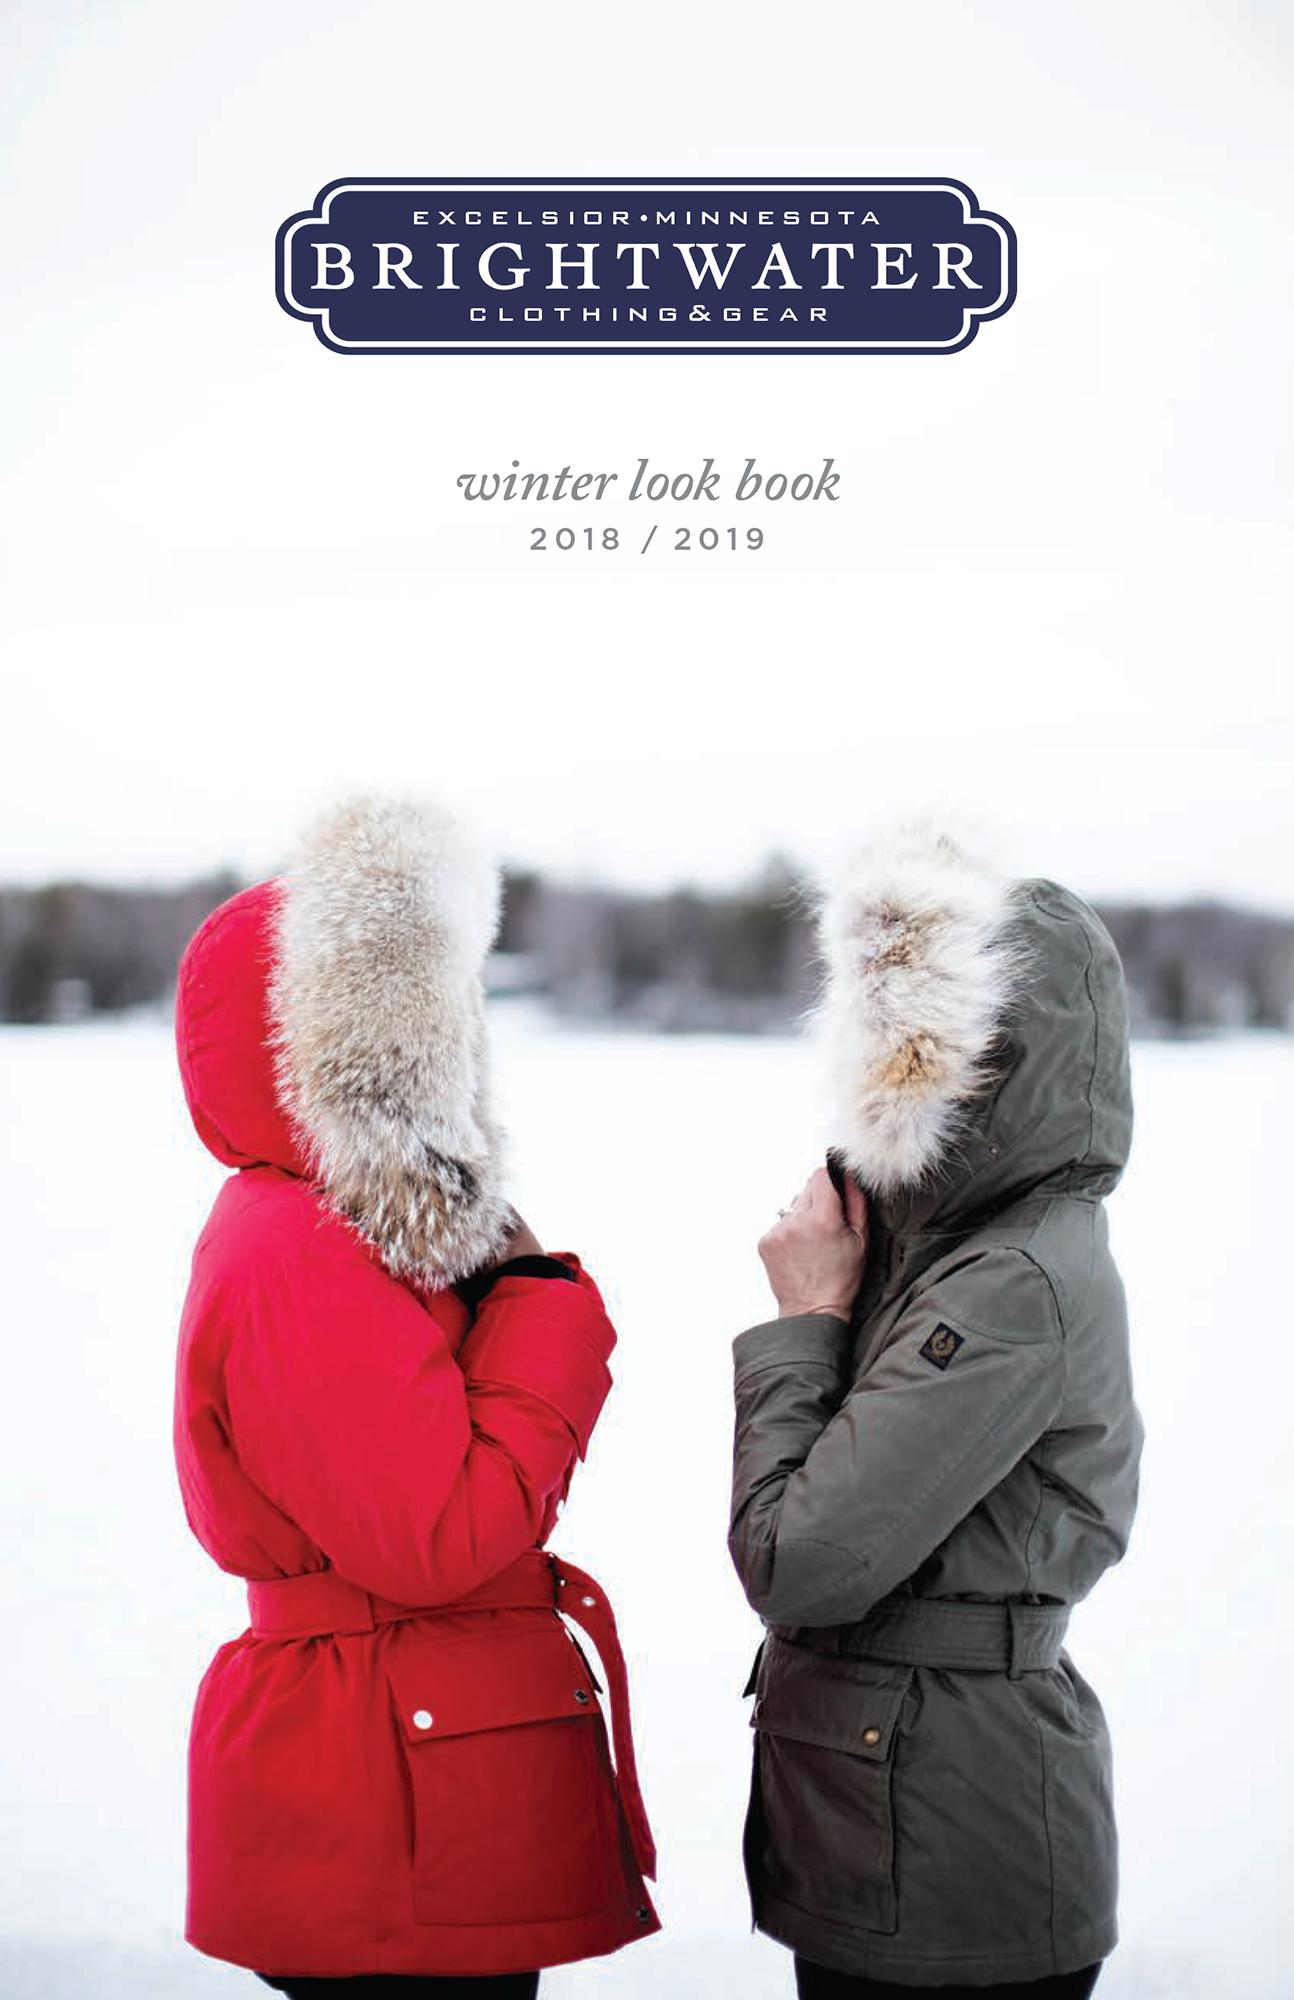 Brightwater Look Book WI18 FS-1.jpg